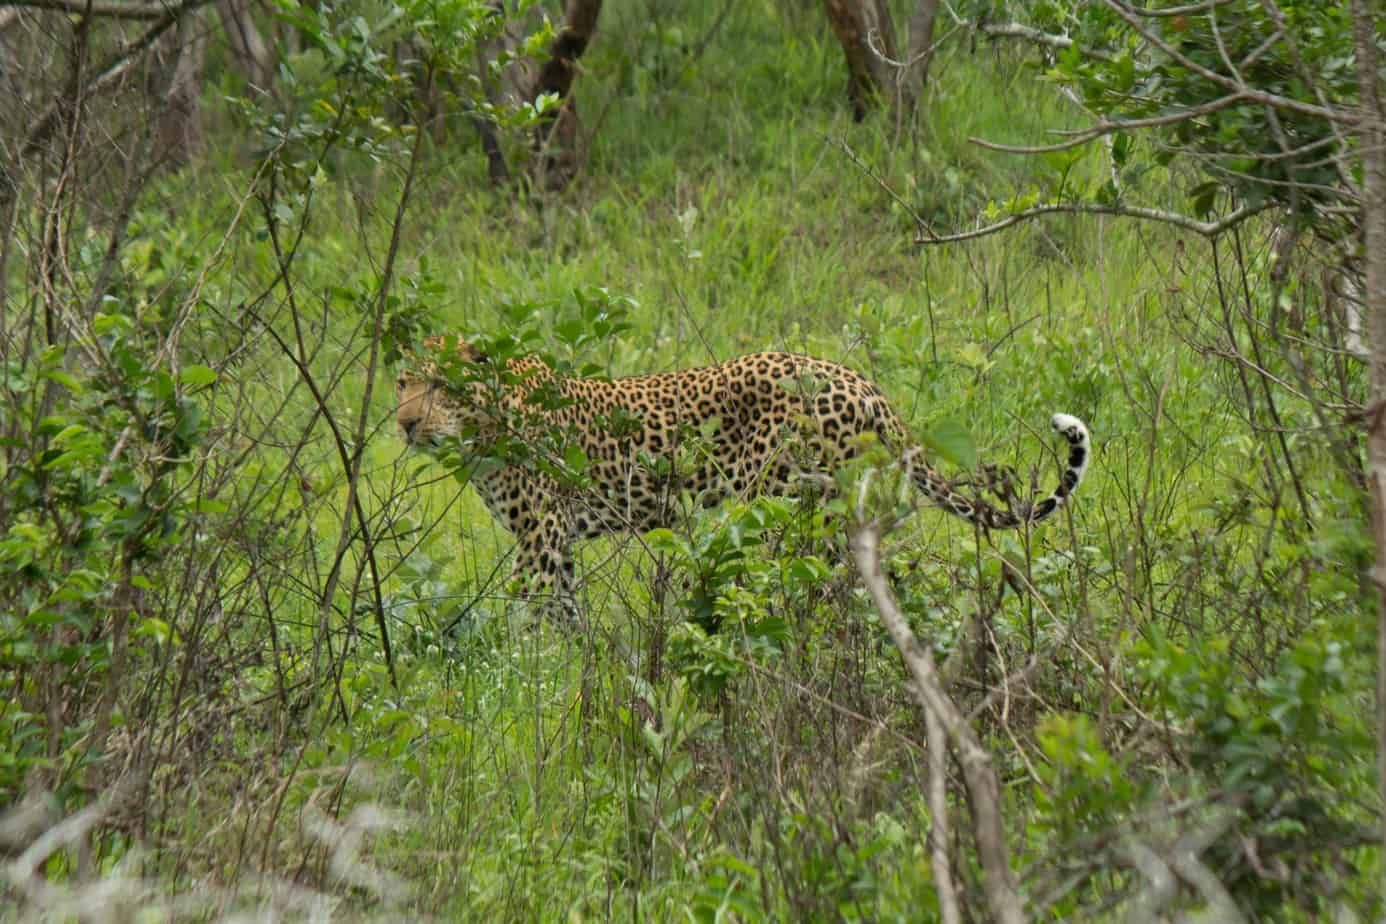 Afrikansk Leopard @ Eastern Shores – iSimangaliso Wetland Park. Foto: Håvard Rosenlund